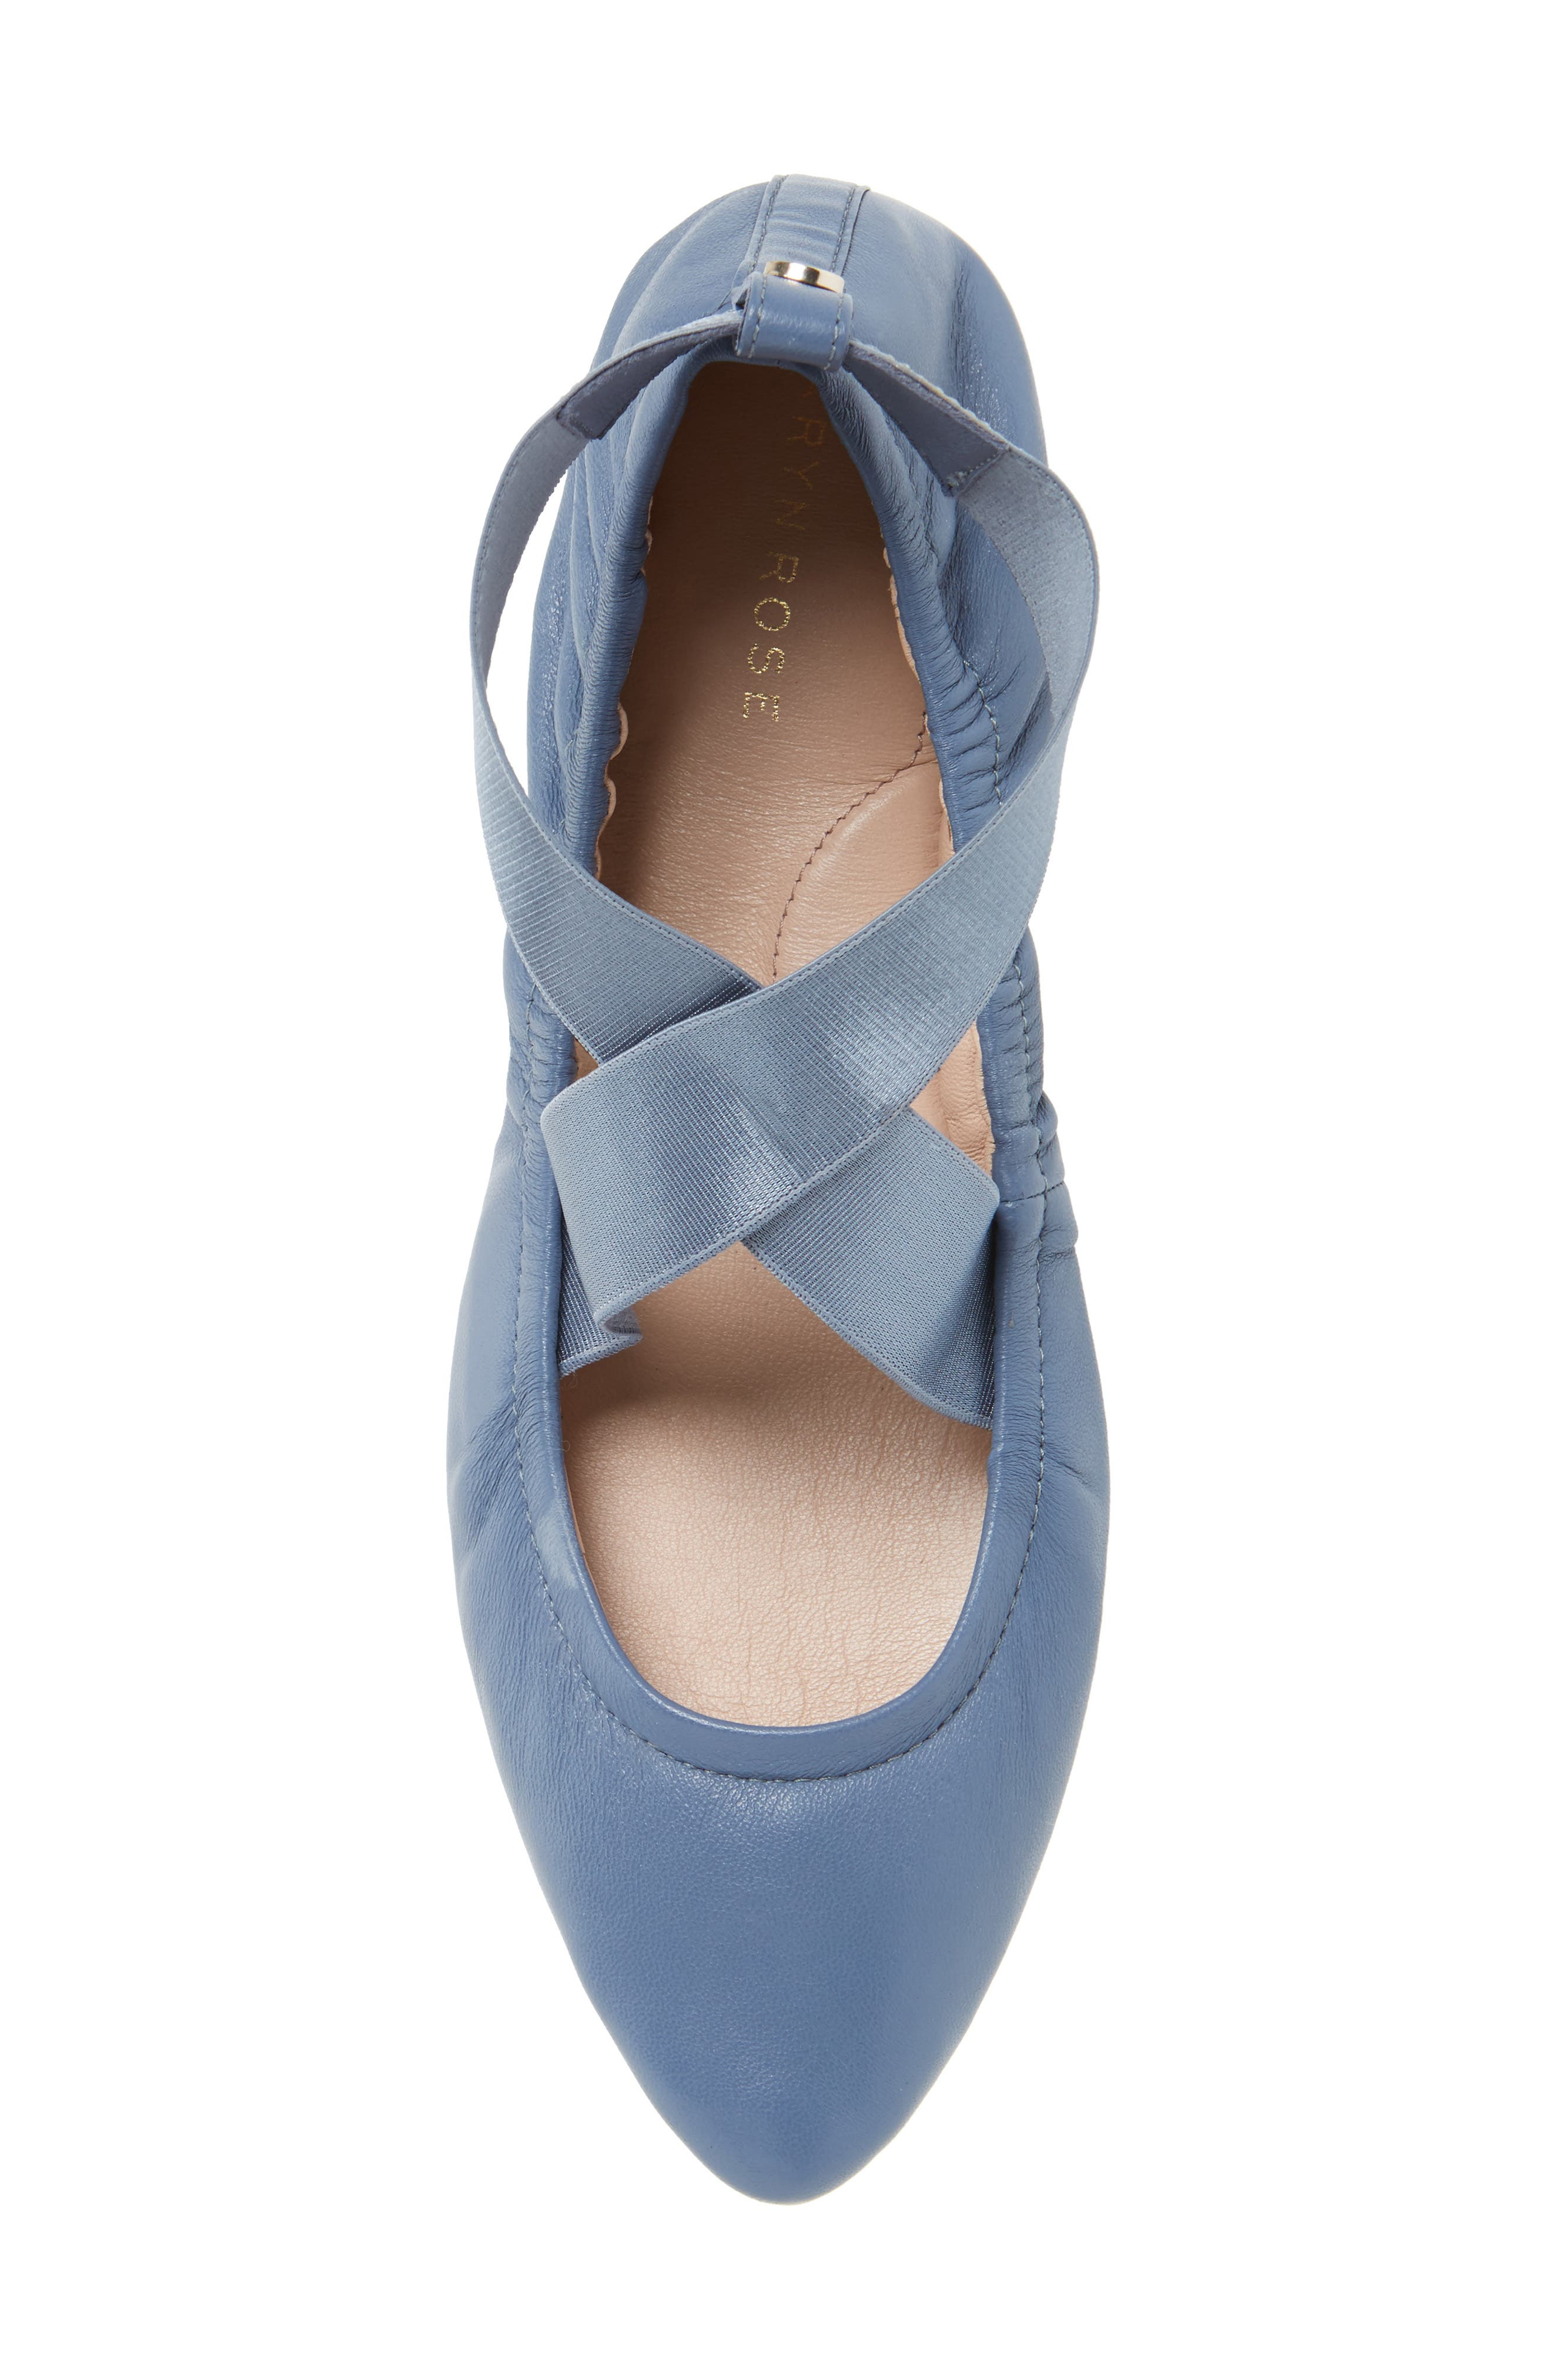 Edina Strappy Ballet Flat,                             Alternate thumbnail 23, color,